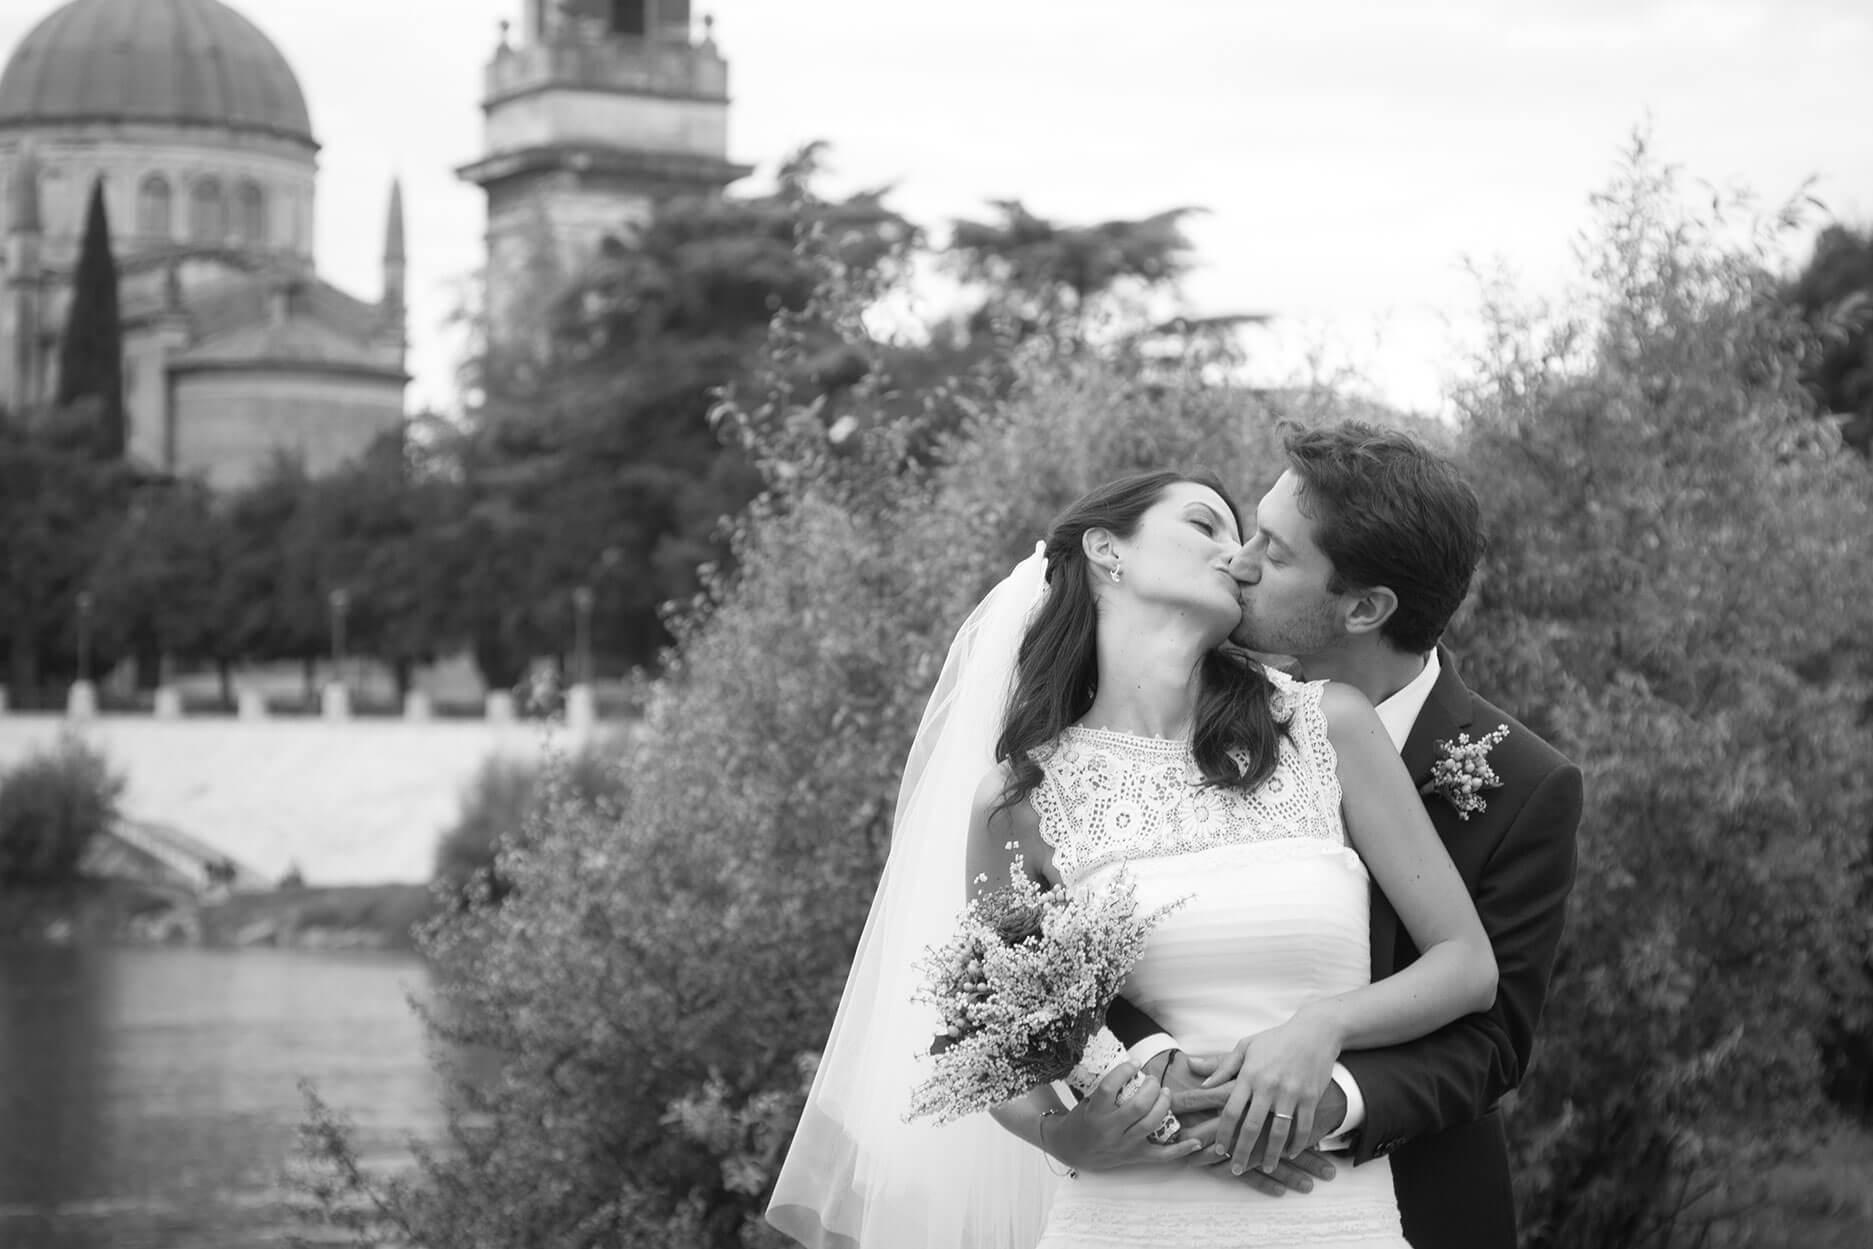 Francesca-Ferrati-WeddingIMG_0949